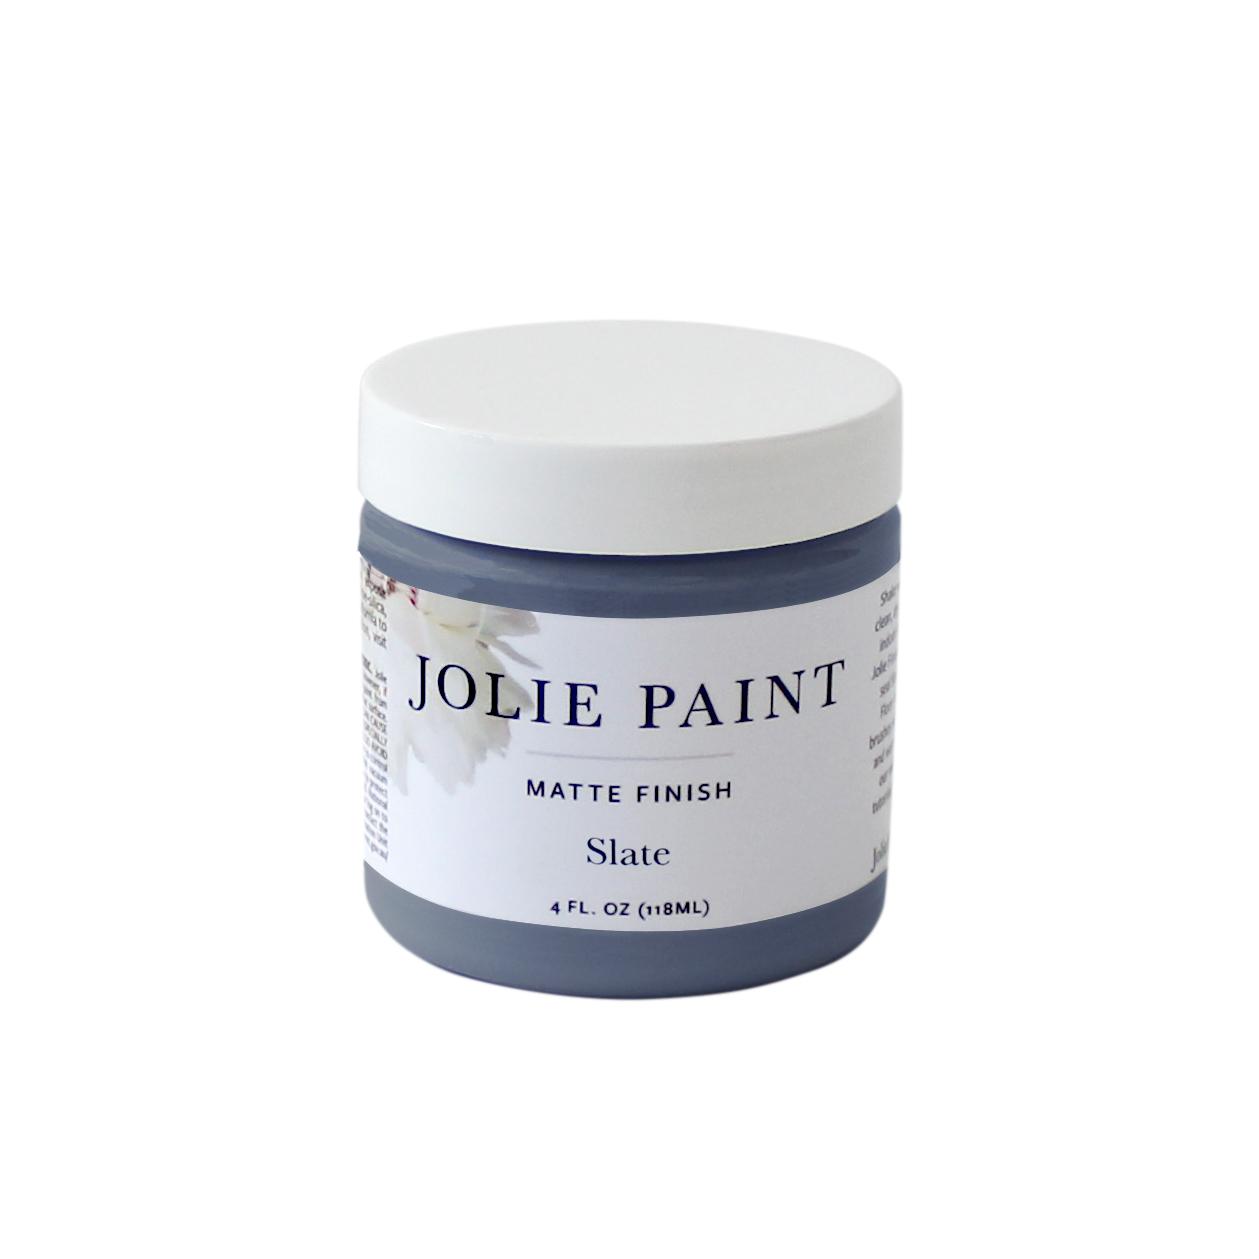 Slate - Jolie Paint (s)